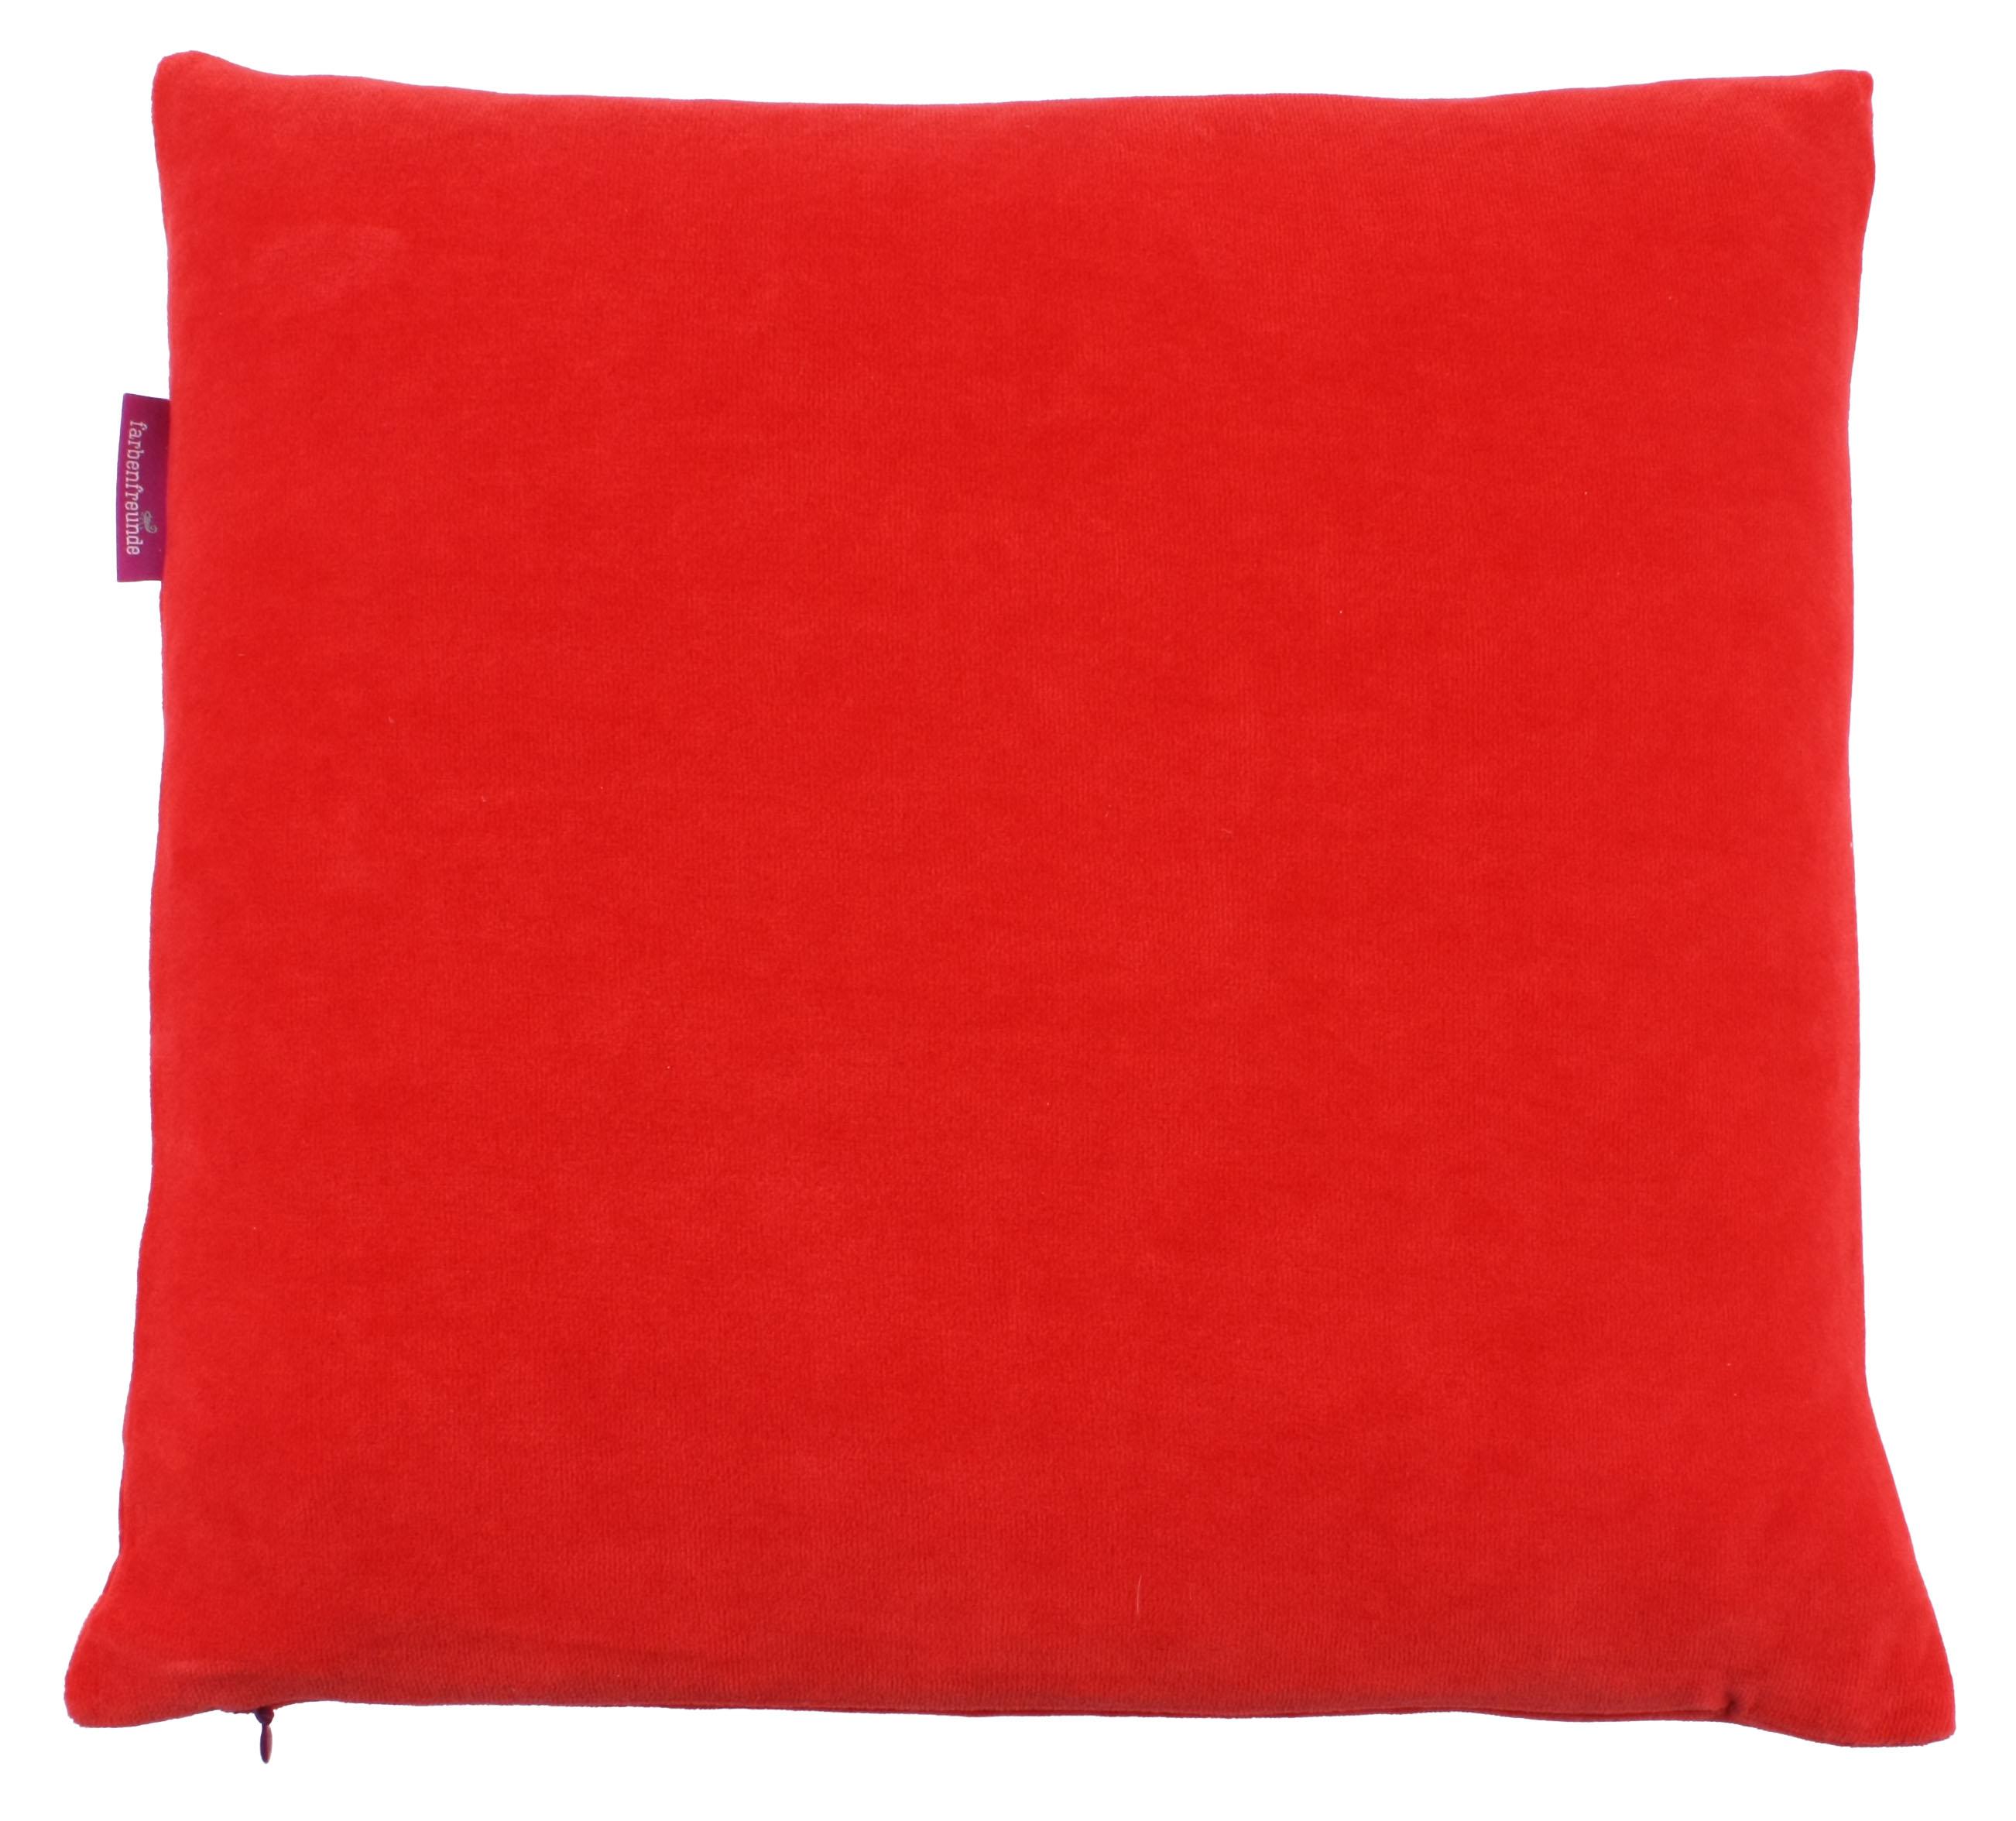 kissenh lle farbenfreunde 40x40 cm blutorange der bettenhaus online shop. Black Bedroom Furniture Sets. Home Design Ideas